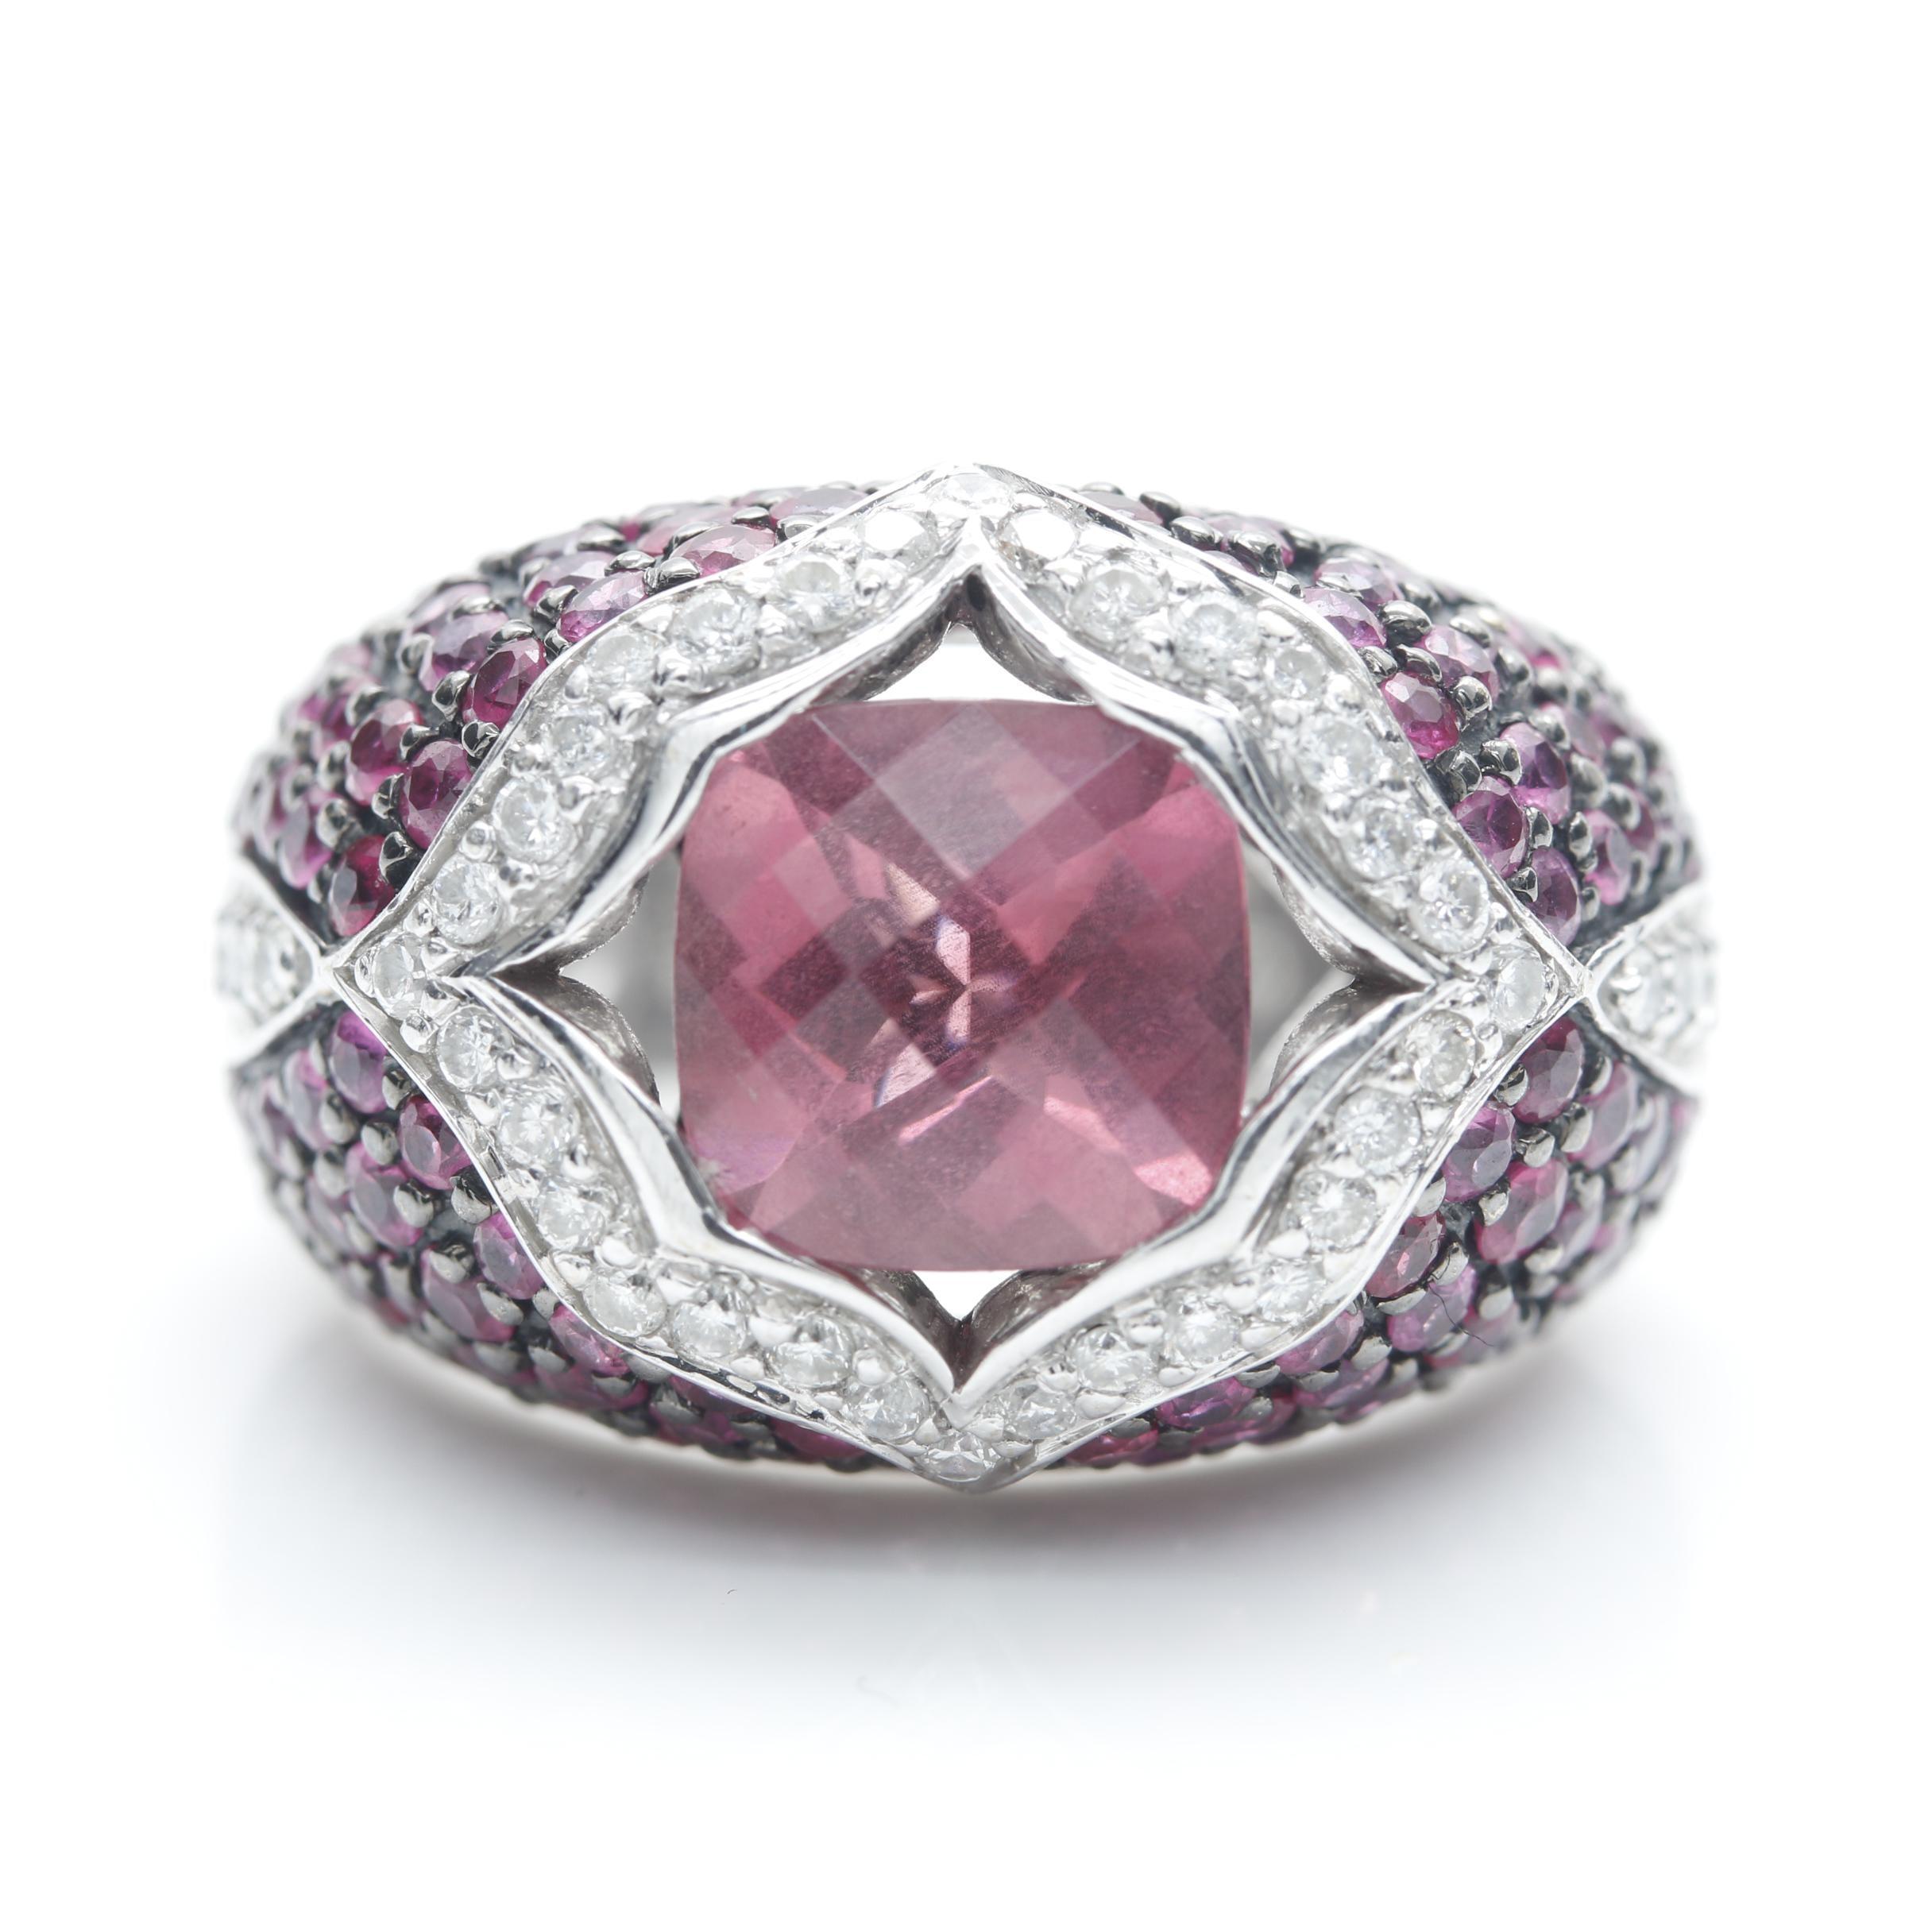 Sonia B. 18K White Gold Pink Tourmaline, Diamond, and Pink Sapphire Ring